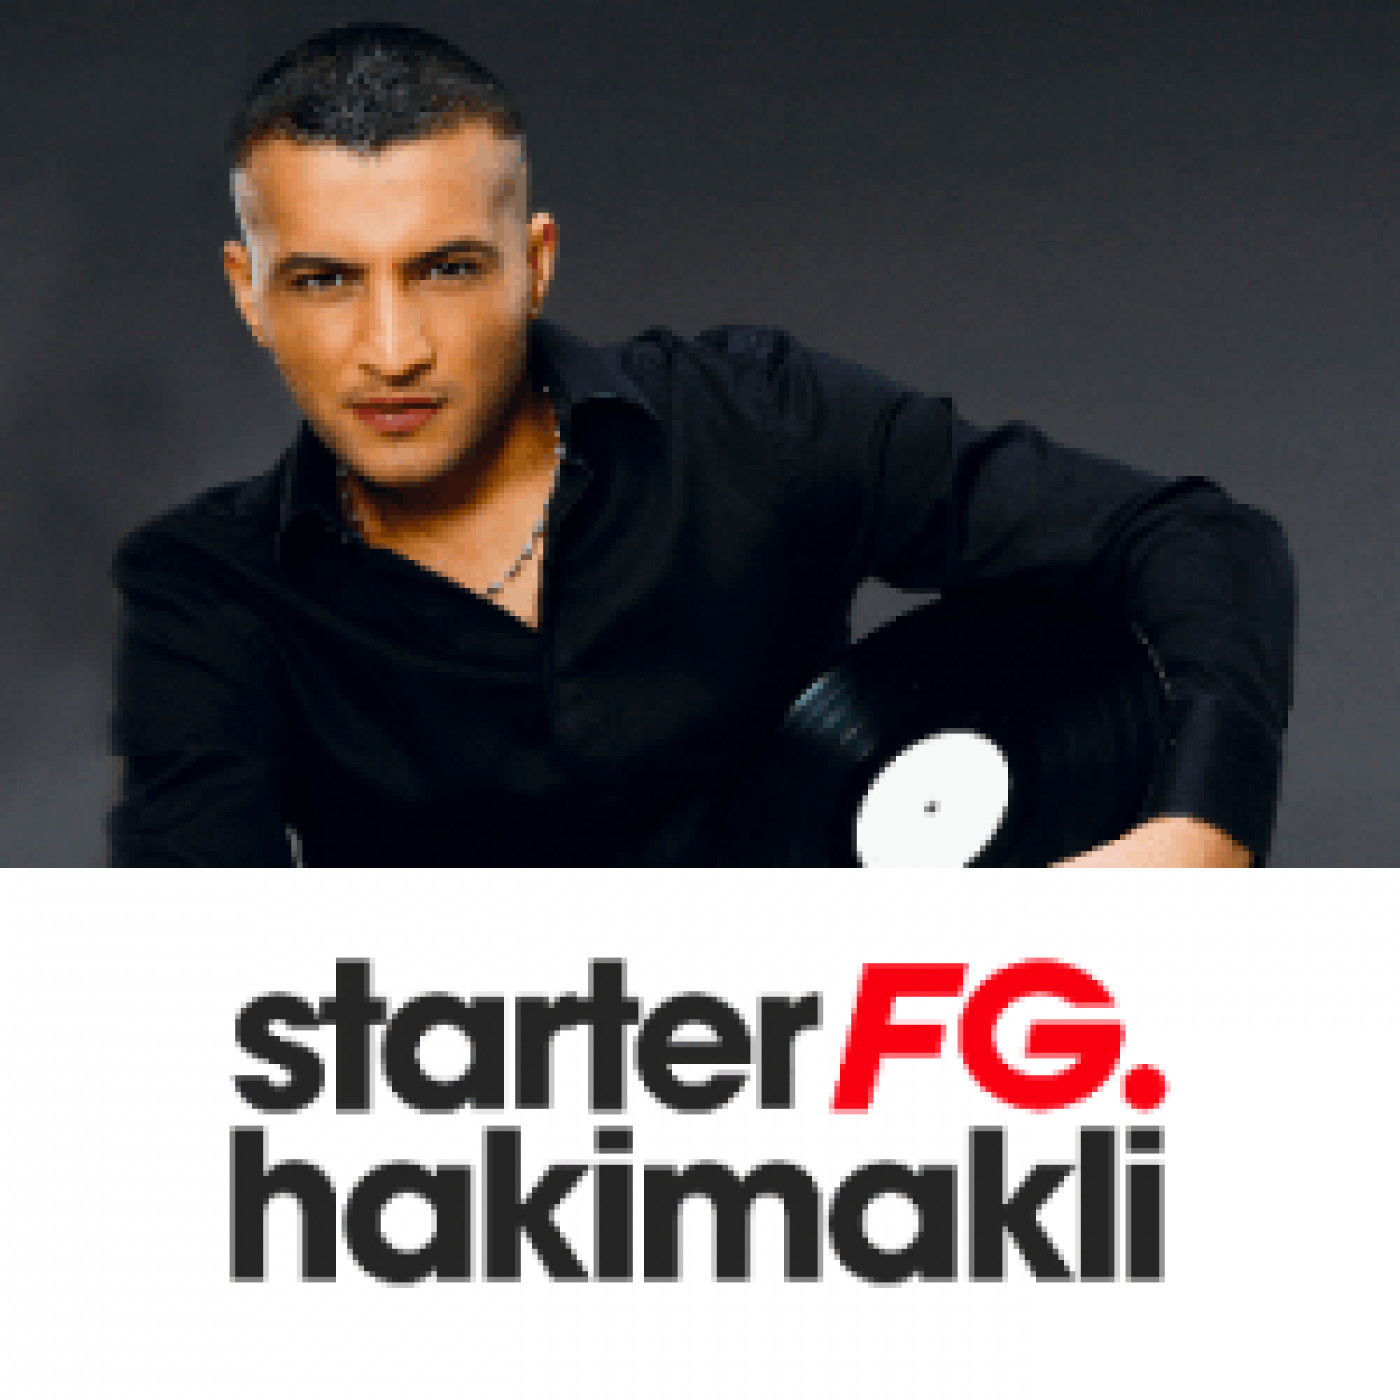 STARTER FG BY HAKIMAKLI MARDI 8 SEPTEMBRE 2020